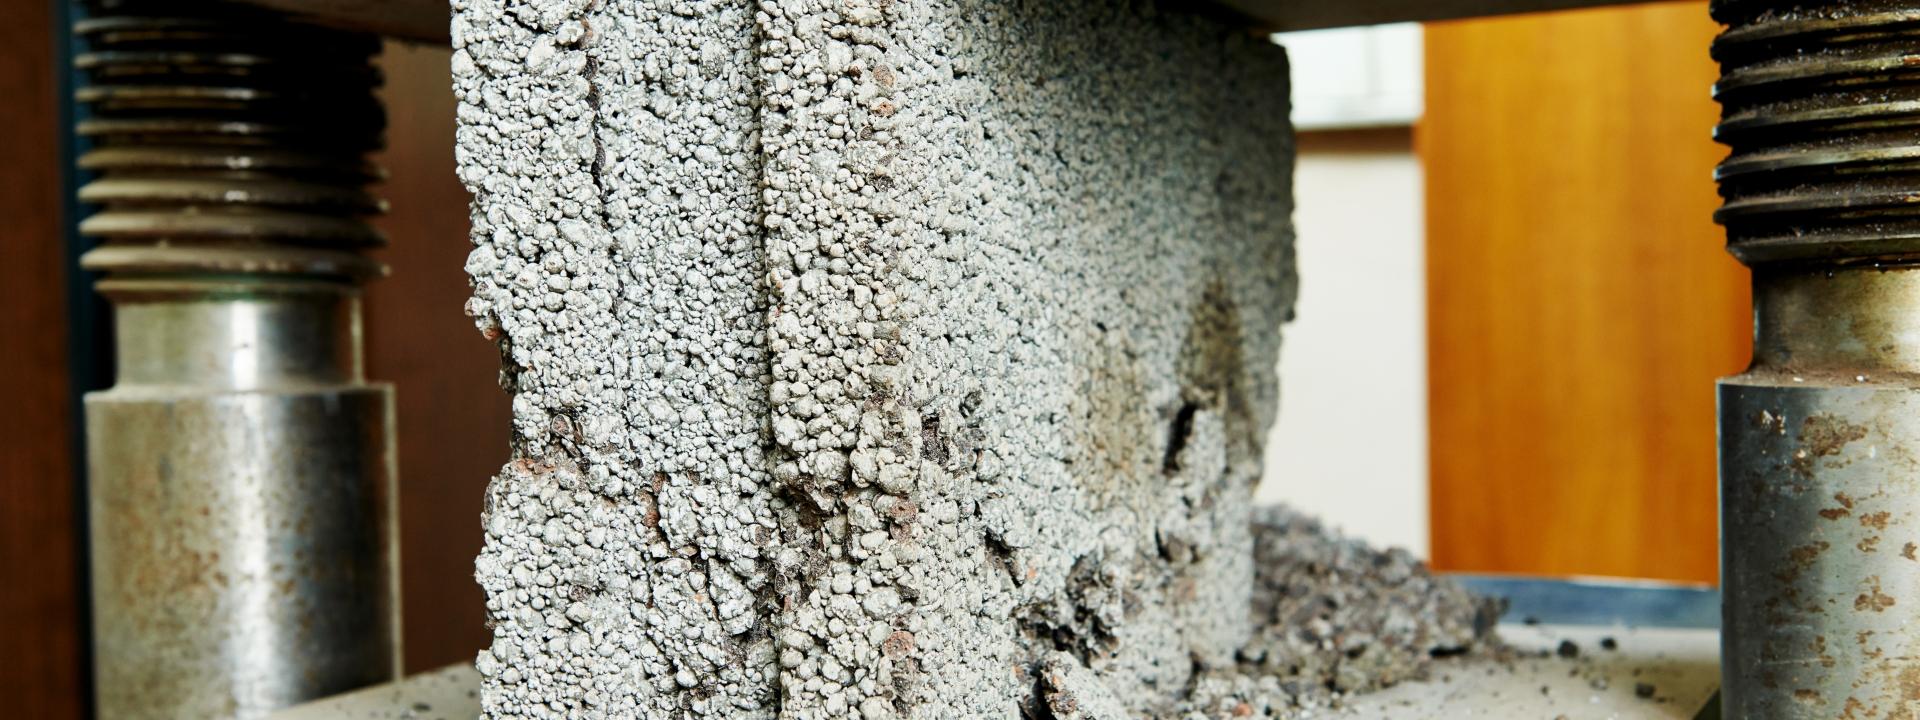 Лаборатория бетон уфа сорочинск бетон